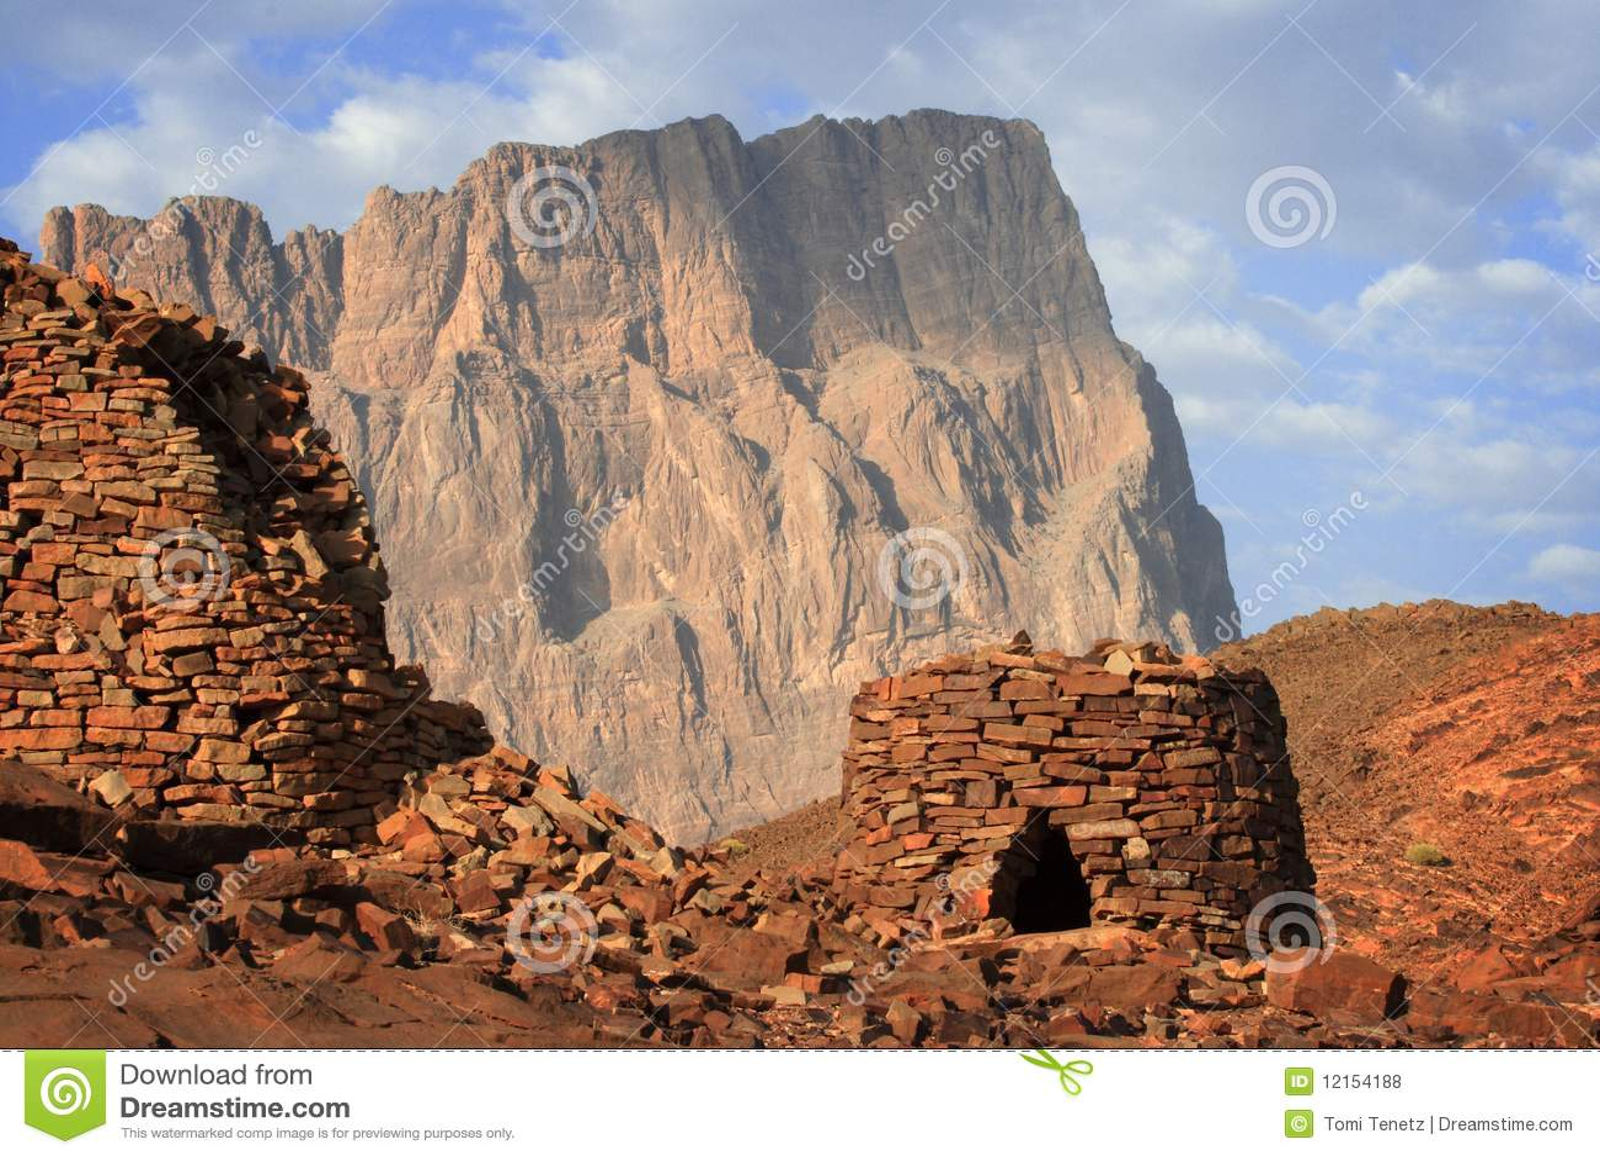 Oman Beehive Tombs Royalty Free Stock Photos Image